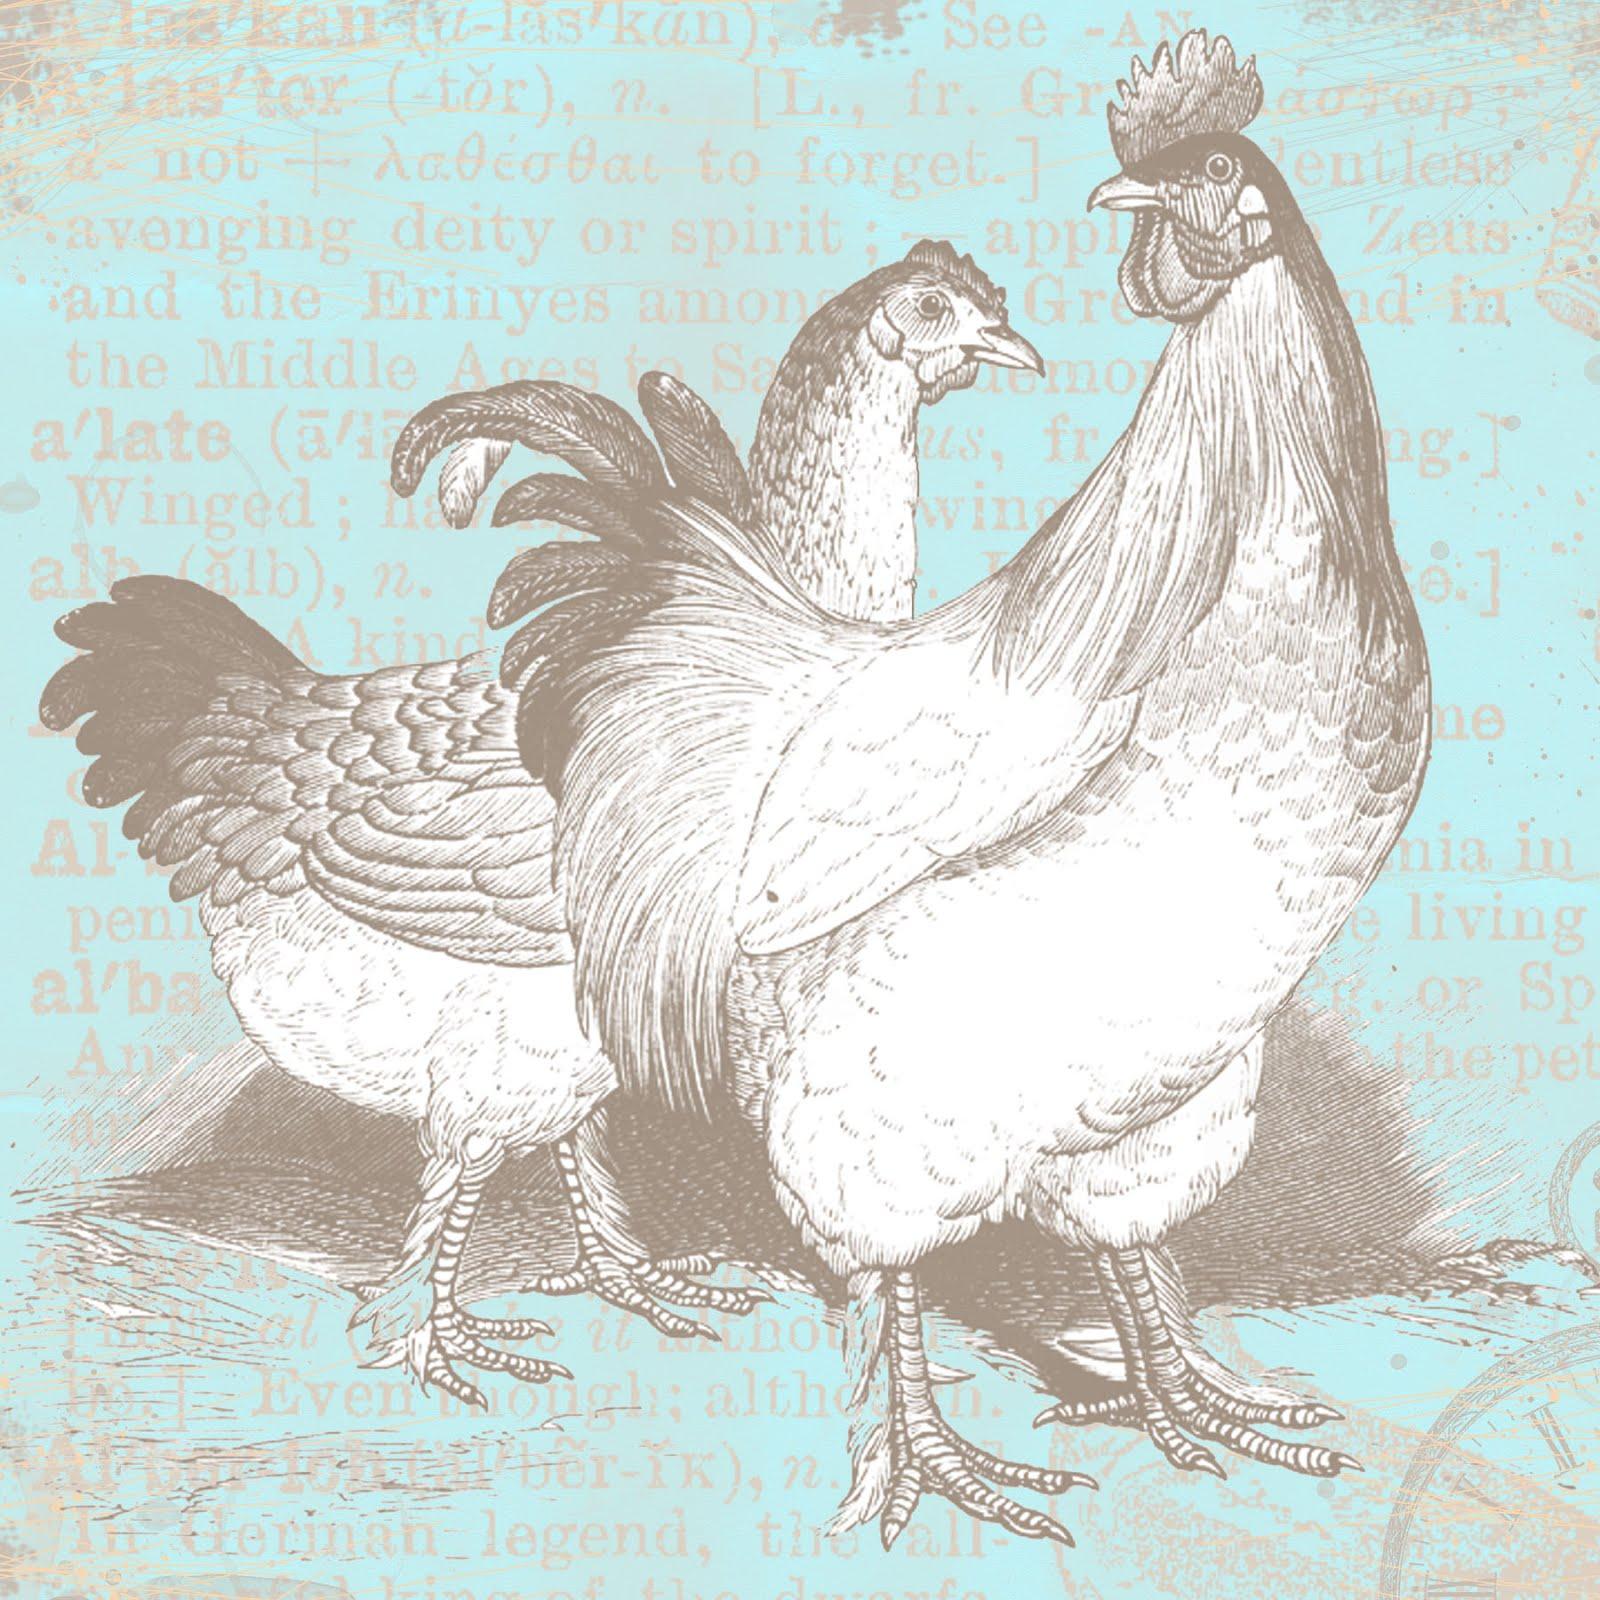 Scrapbook paper store - Free Digital Scrapbook Paper Vintage Chickens